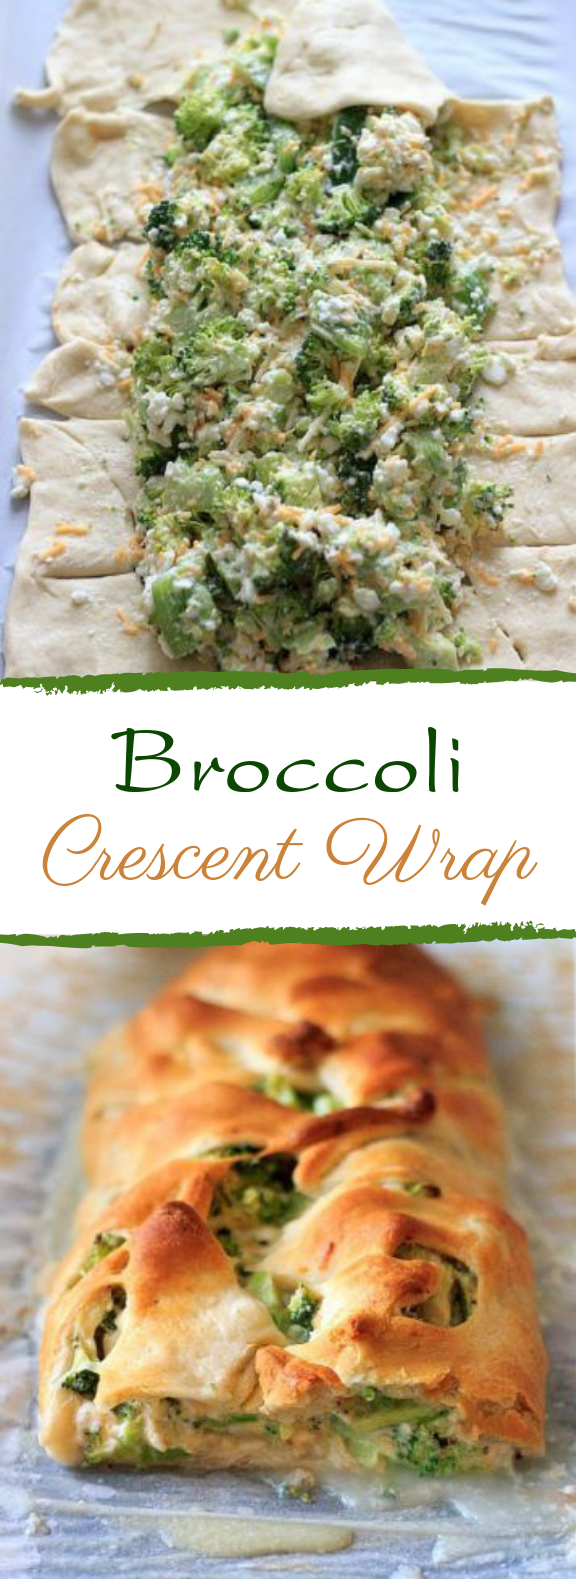 Broccoli Crescent Wrap #easyrecipe #vegetarian